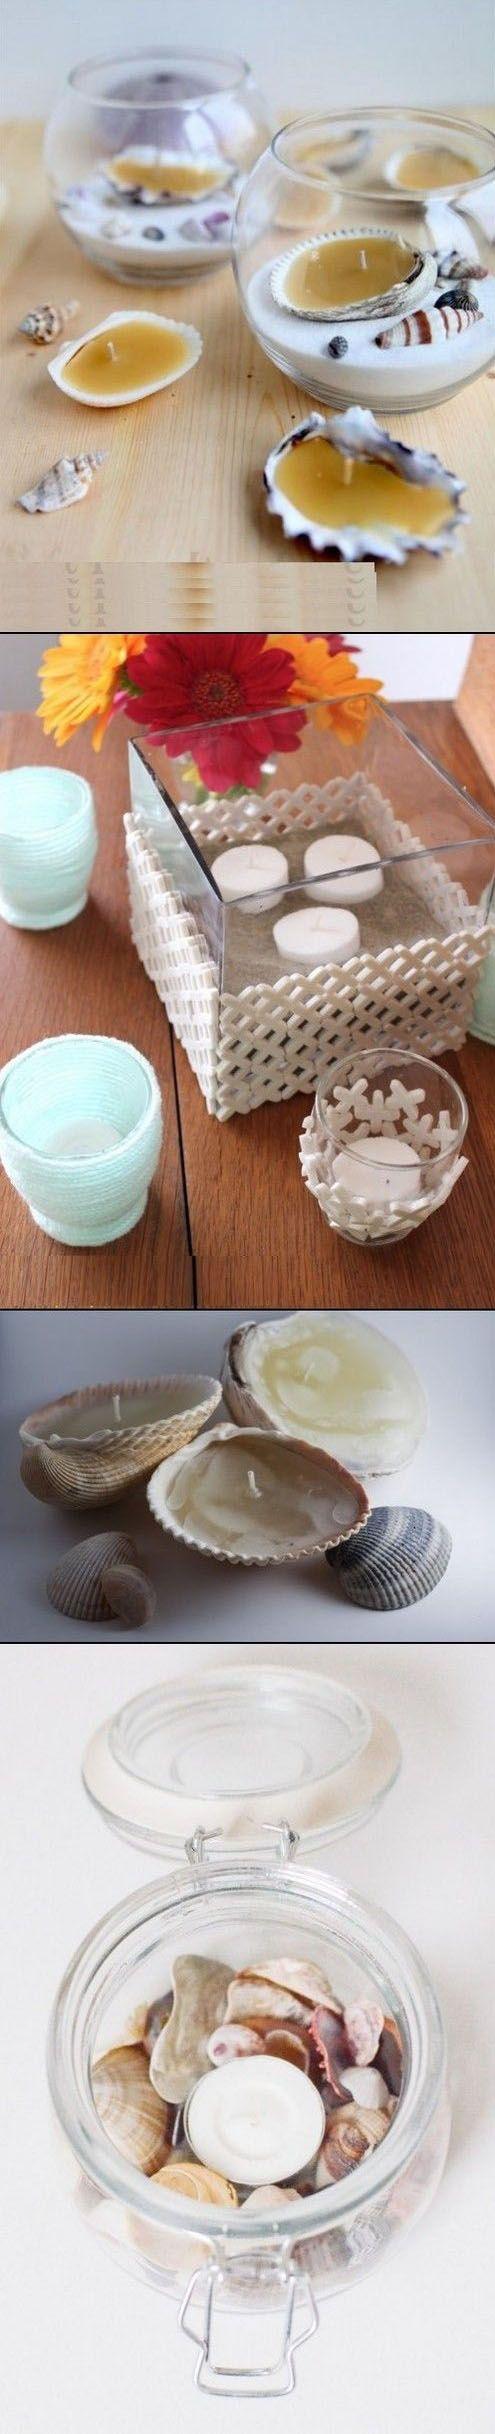 Diy Cool Candle Holder | DIY & Crafts Tutorials